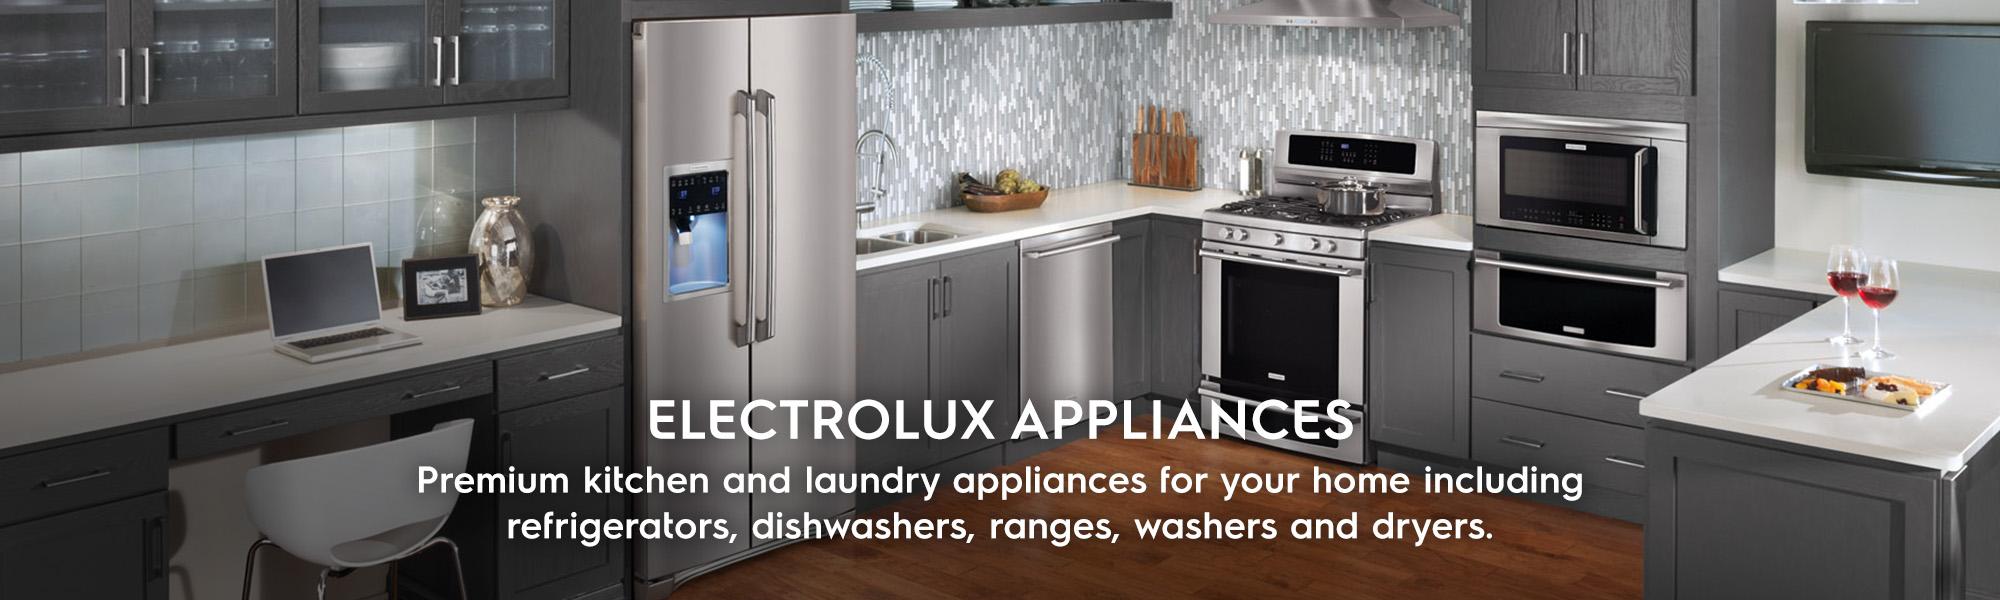 electrolux appliances - home appliances -mattress in charlotte